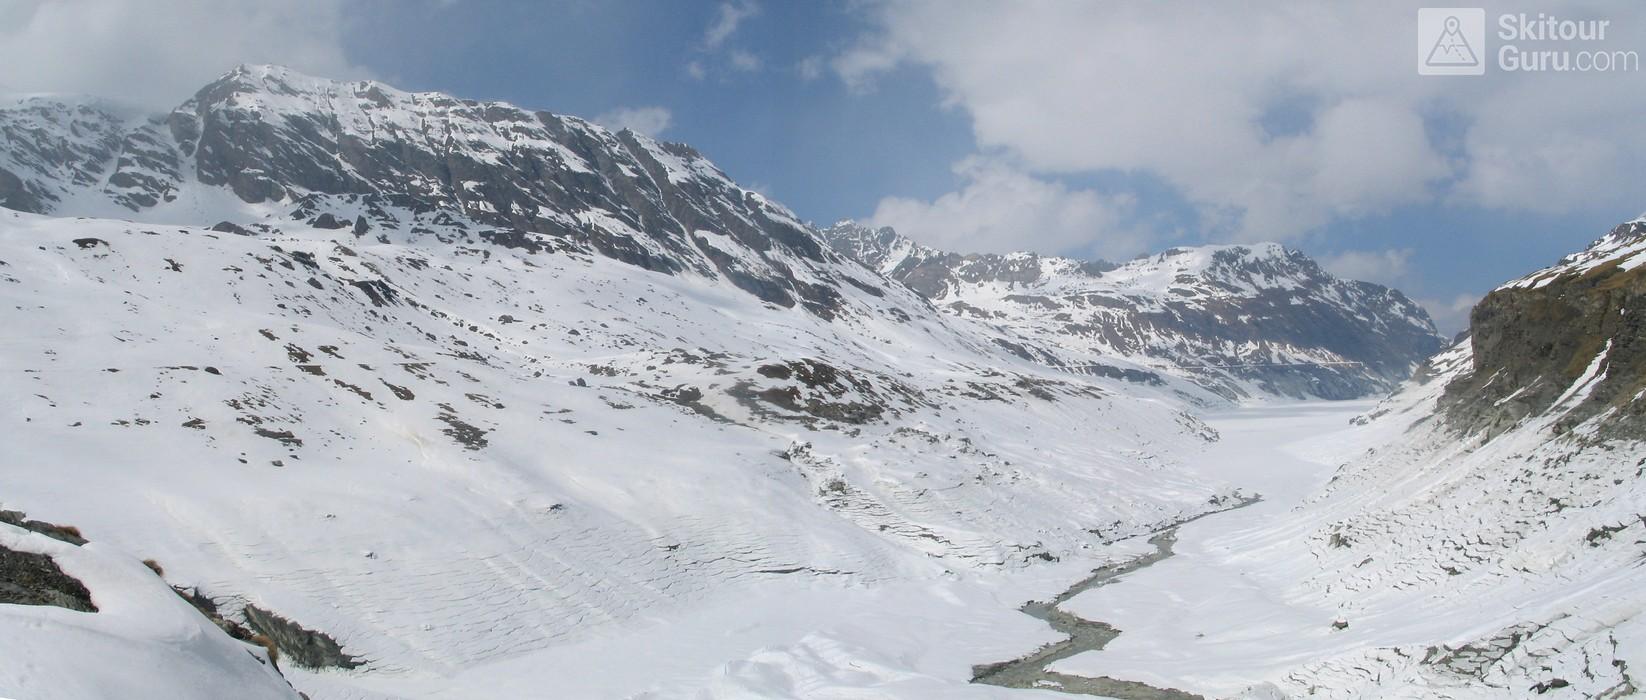 Cabane des Dix Walliser Alpen / Alpes valaisannes Switzerland panorama 15